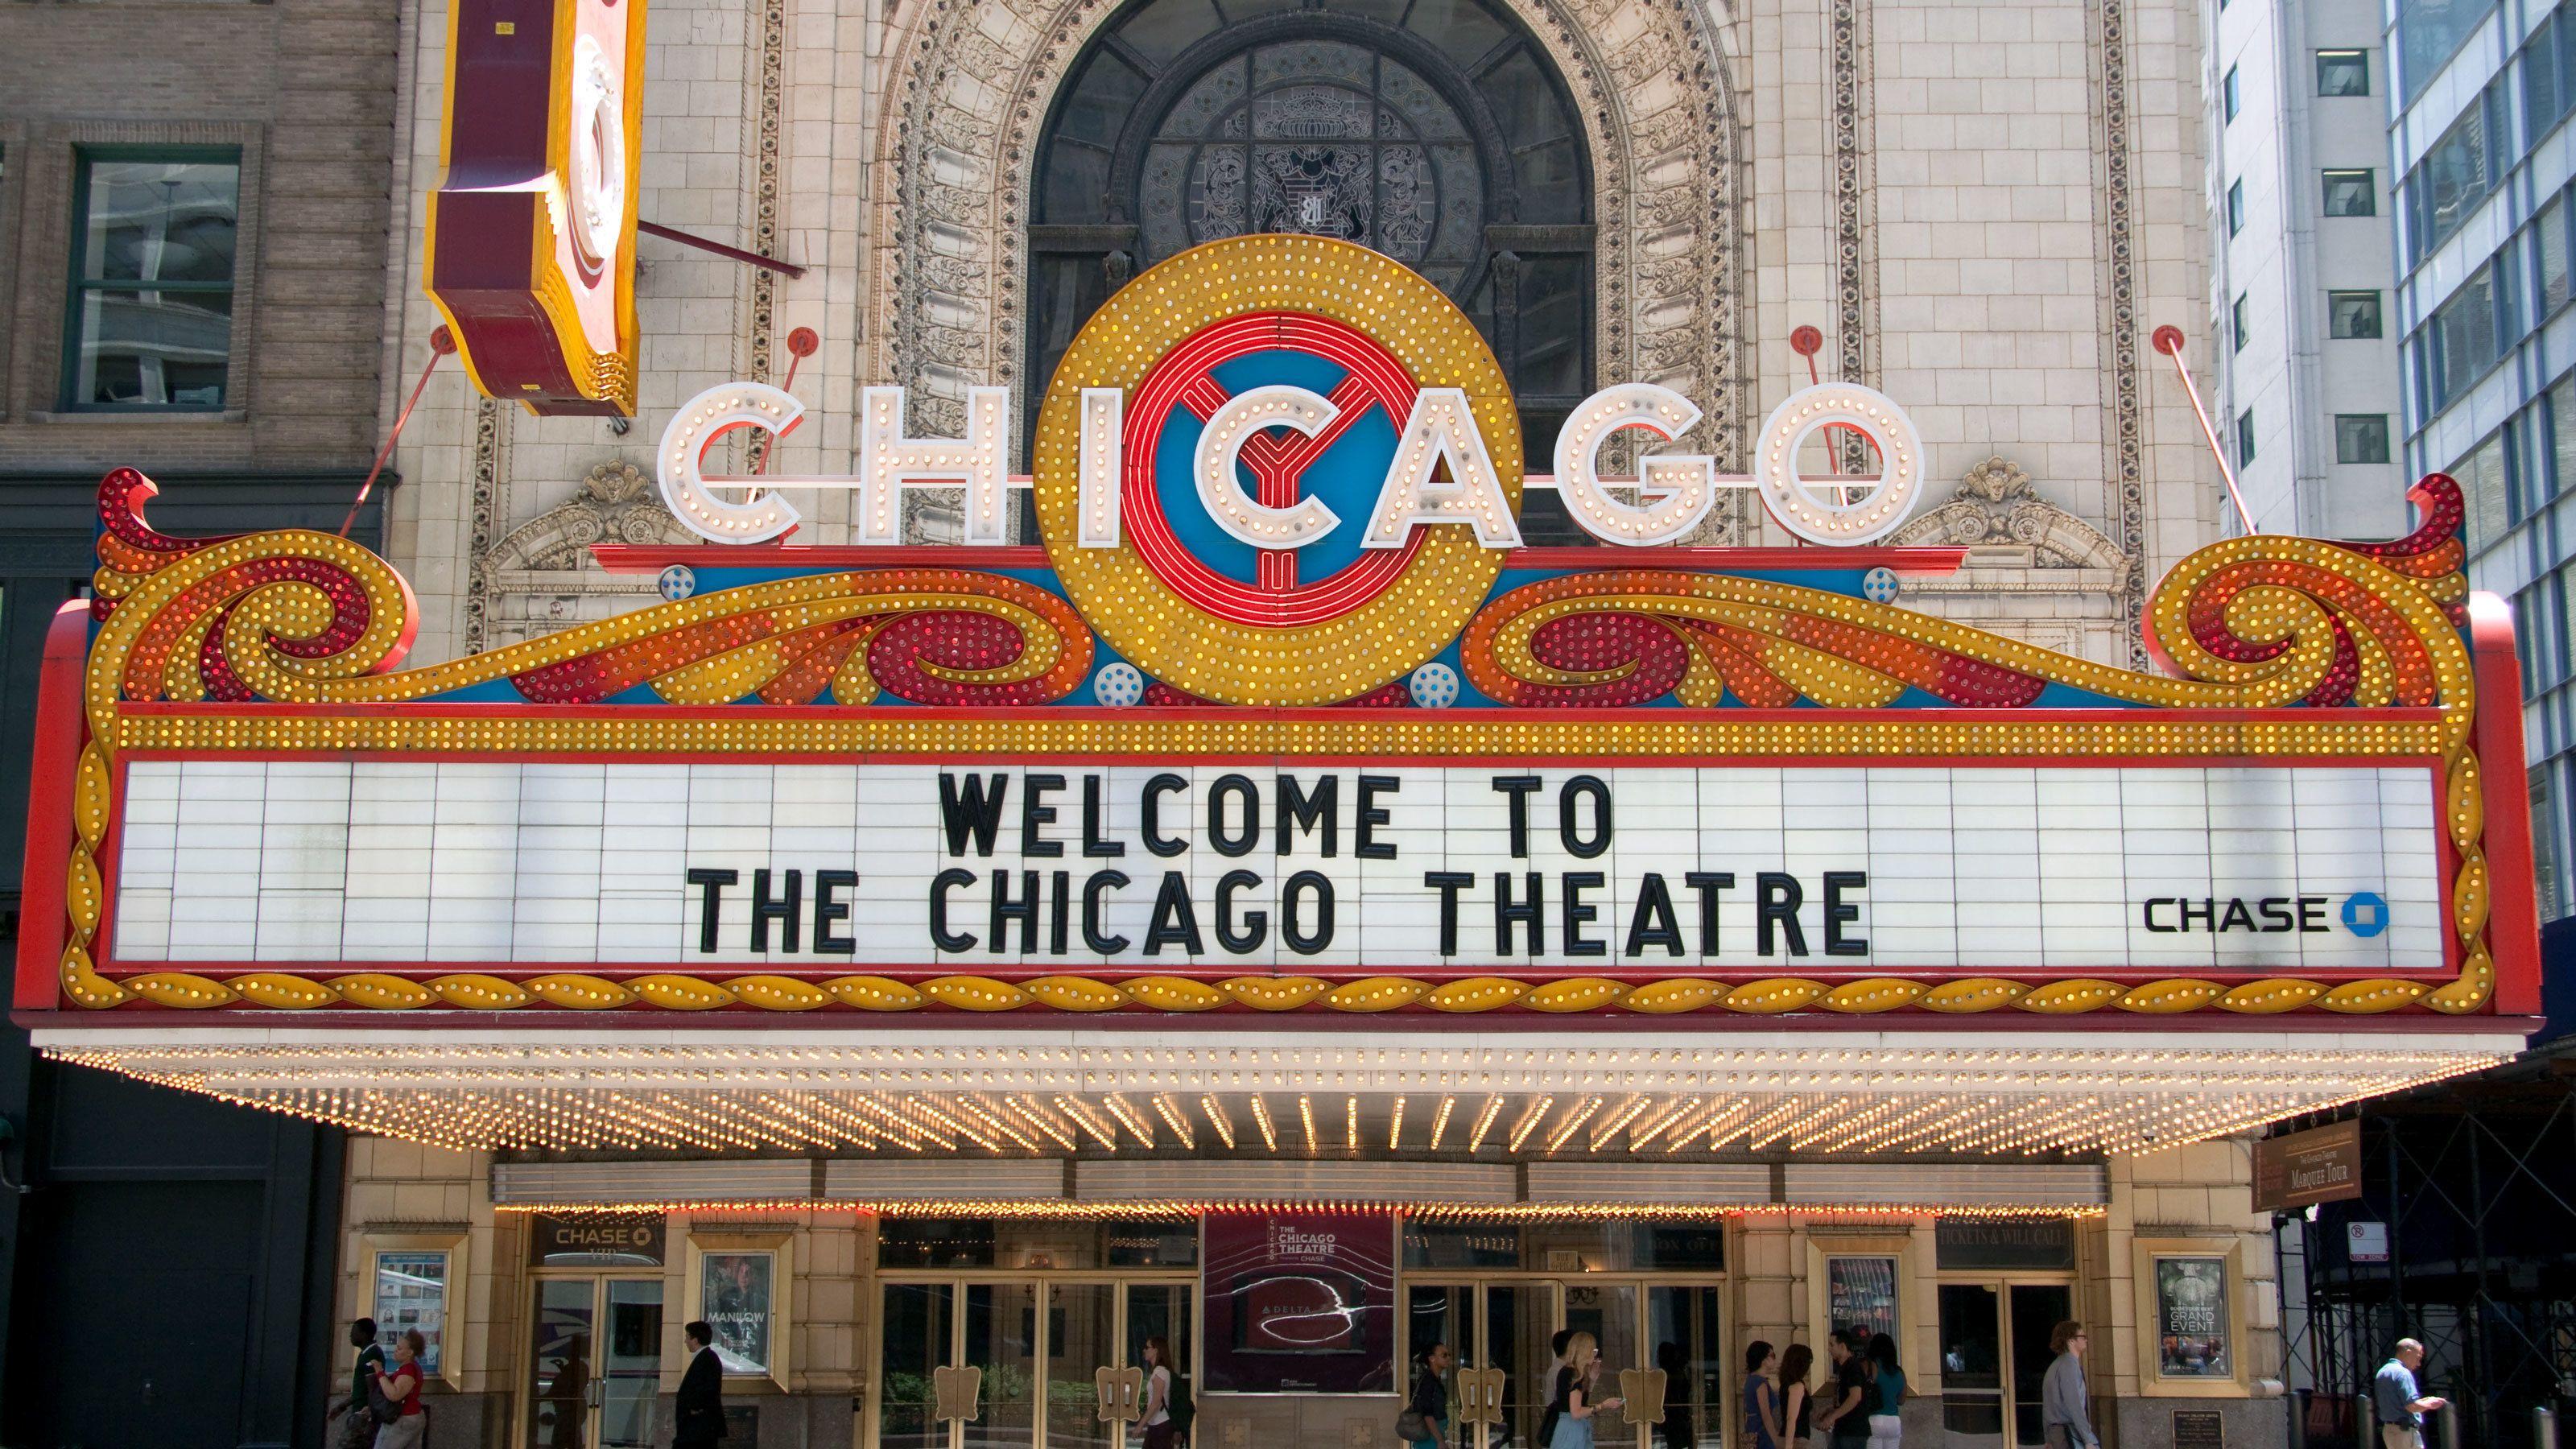 Chicago theatre sign in Illinois